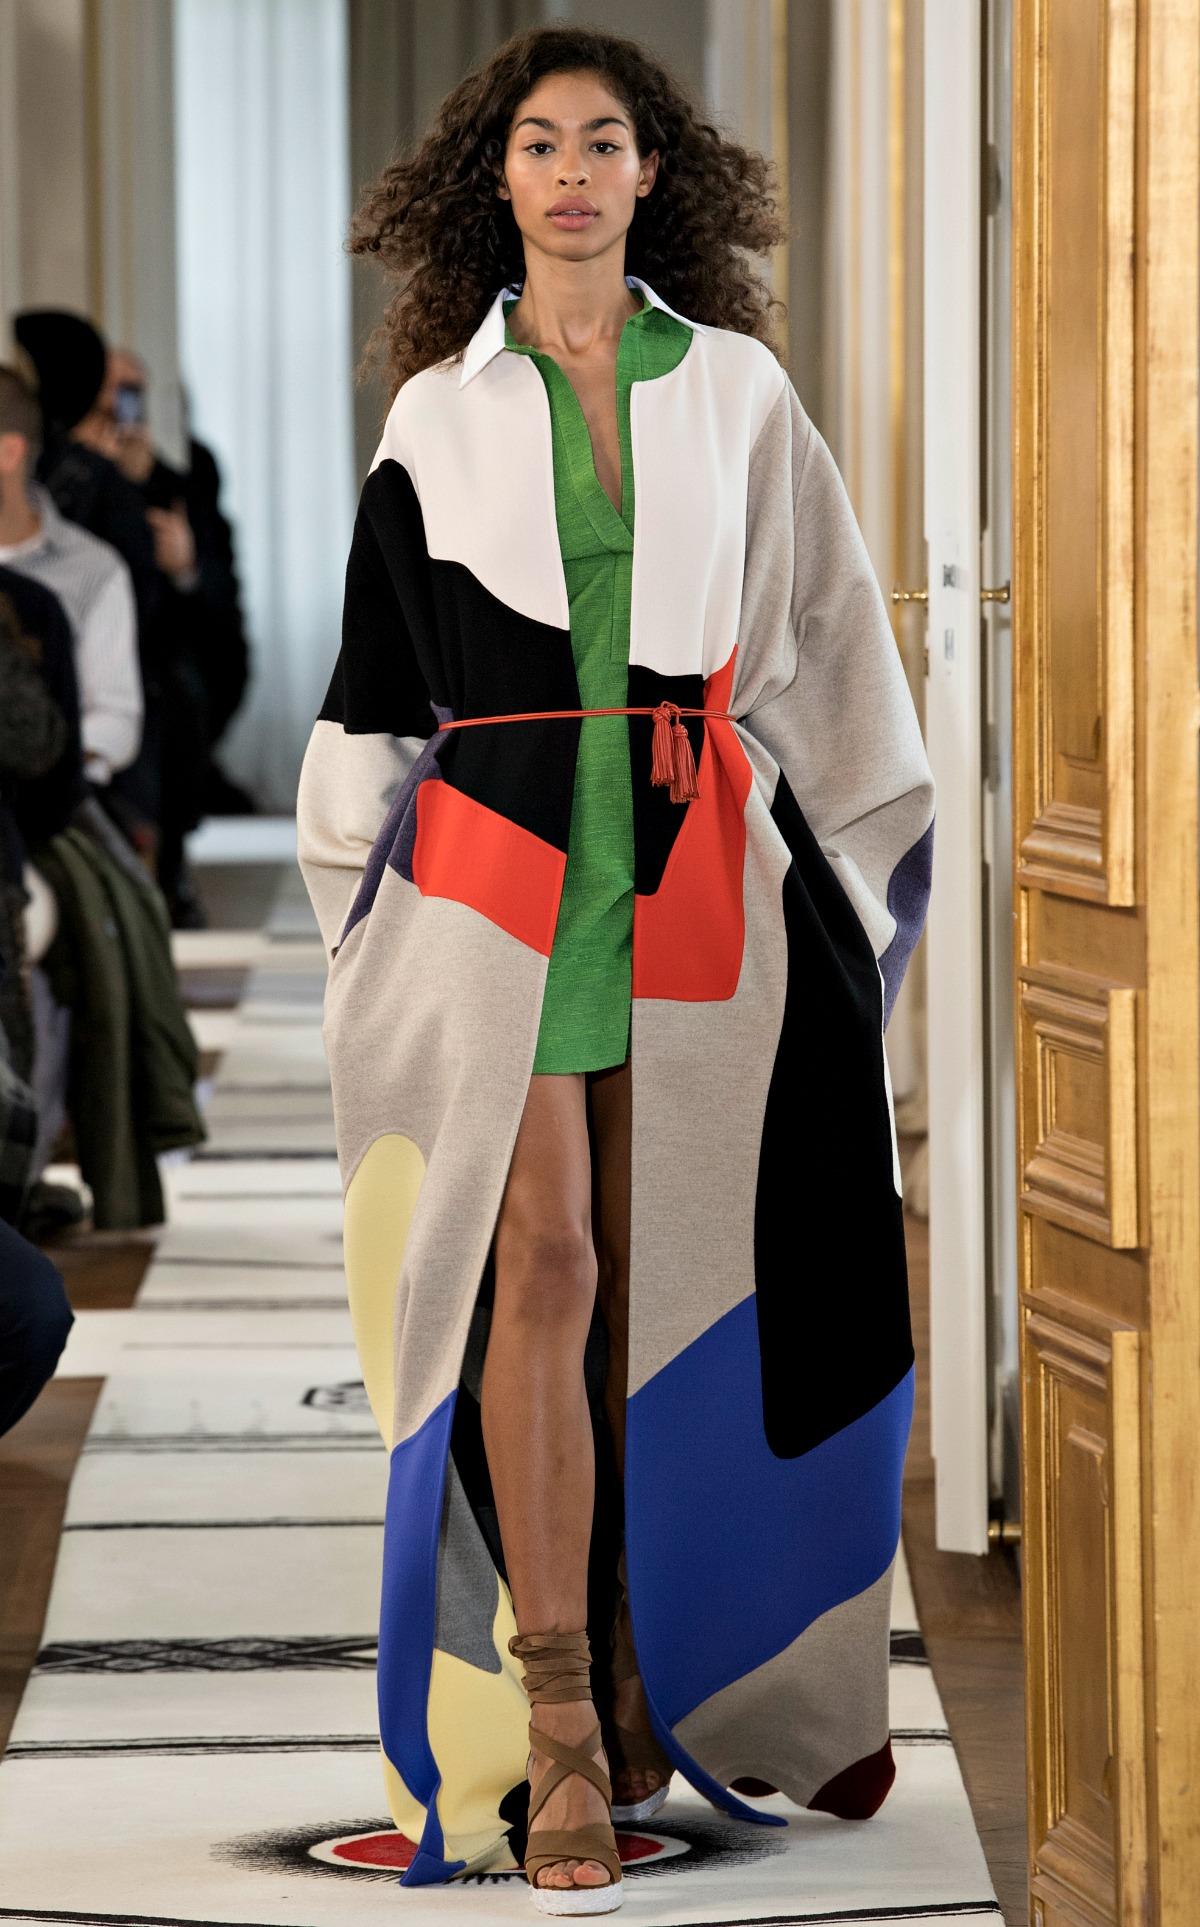 Schiaparelli Spring 2018 Couture Runway at Paris Fashion Week I DreaminLace.com